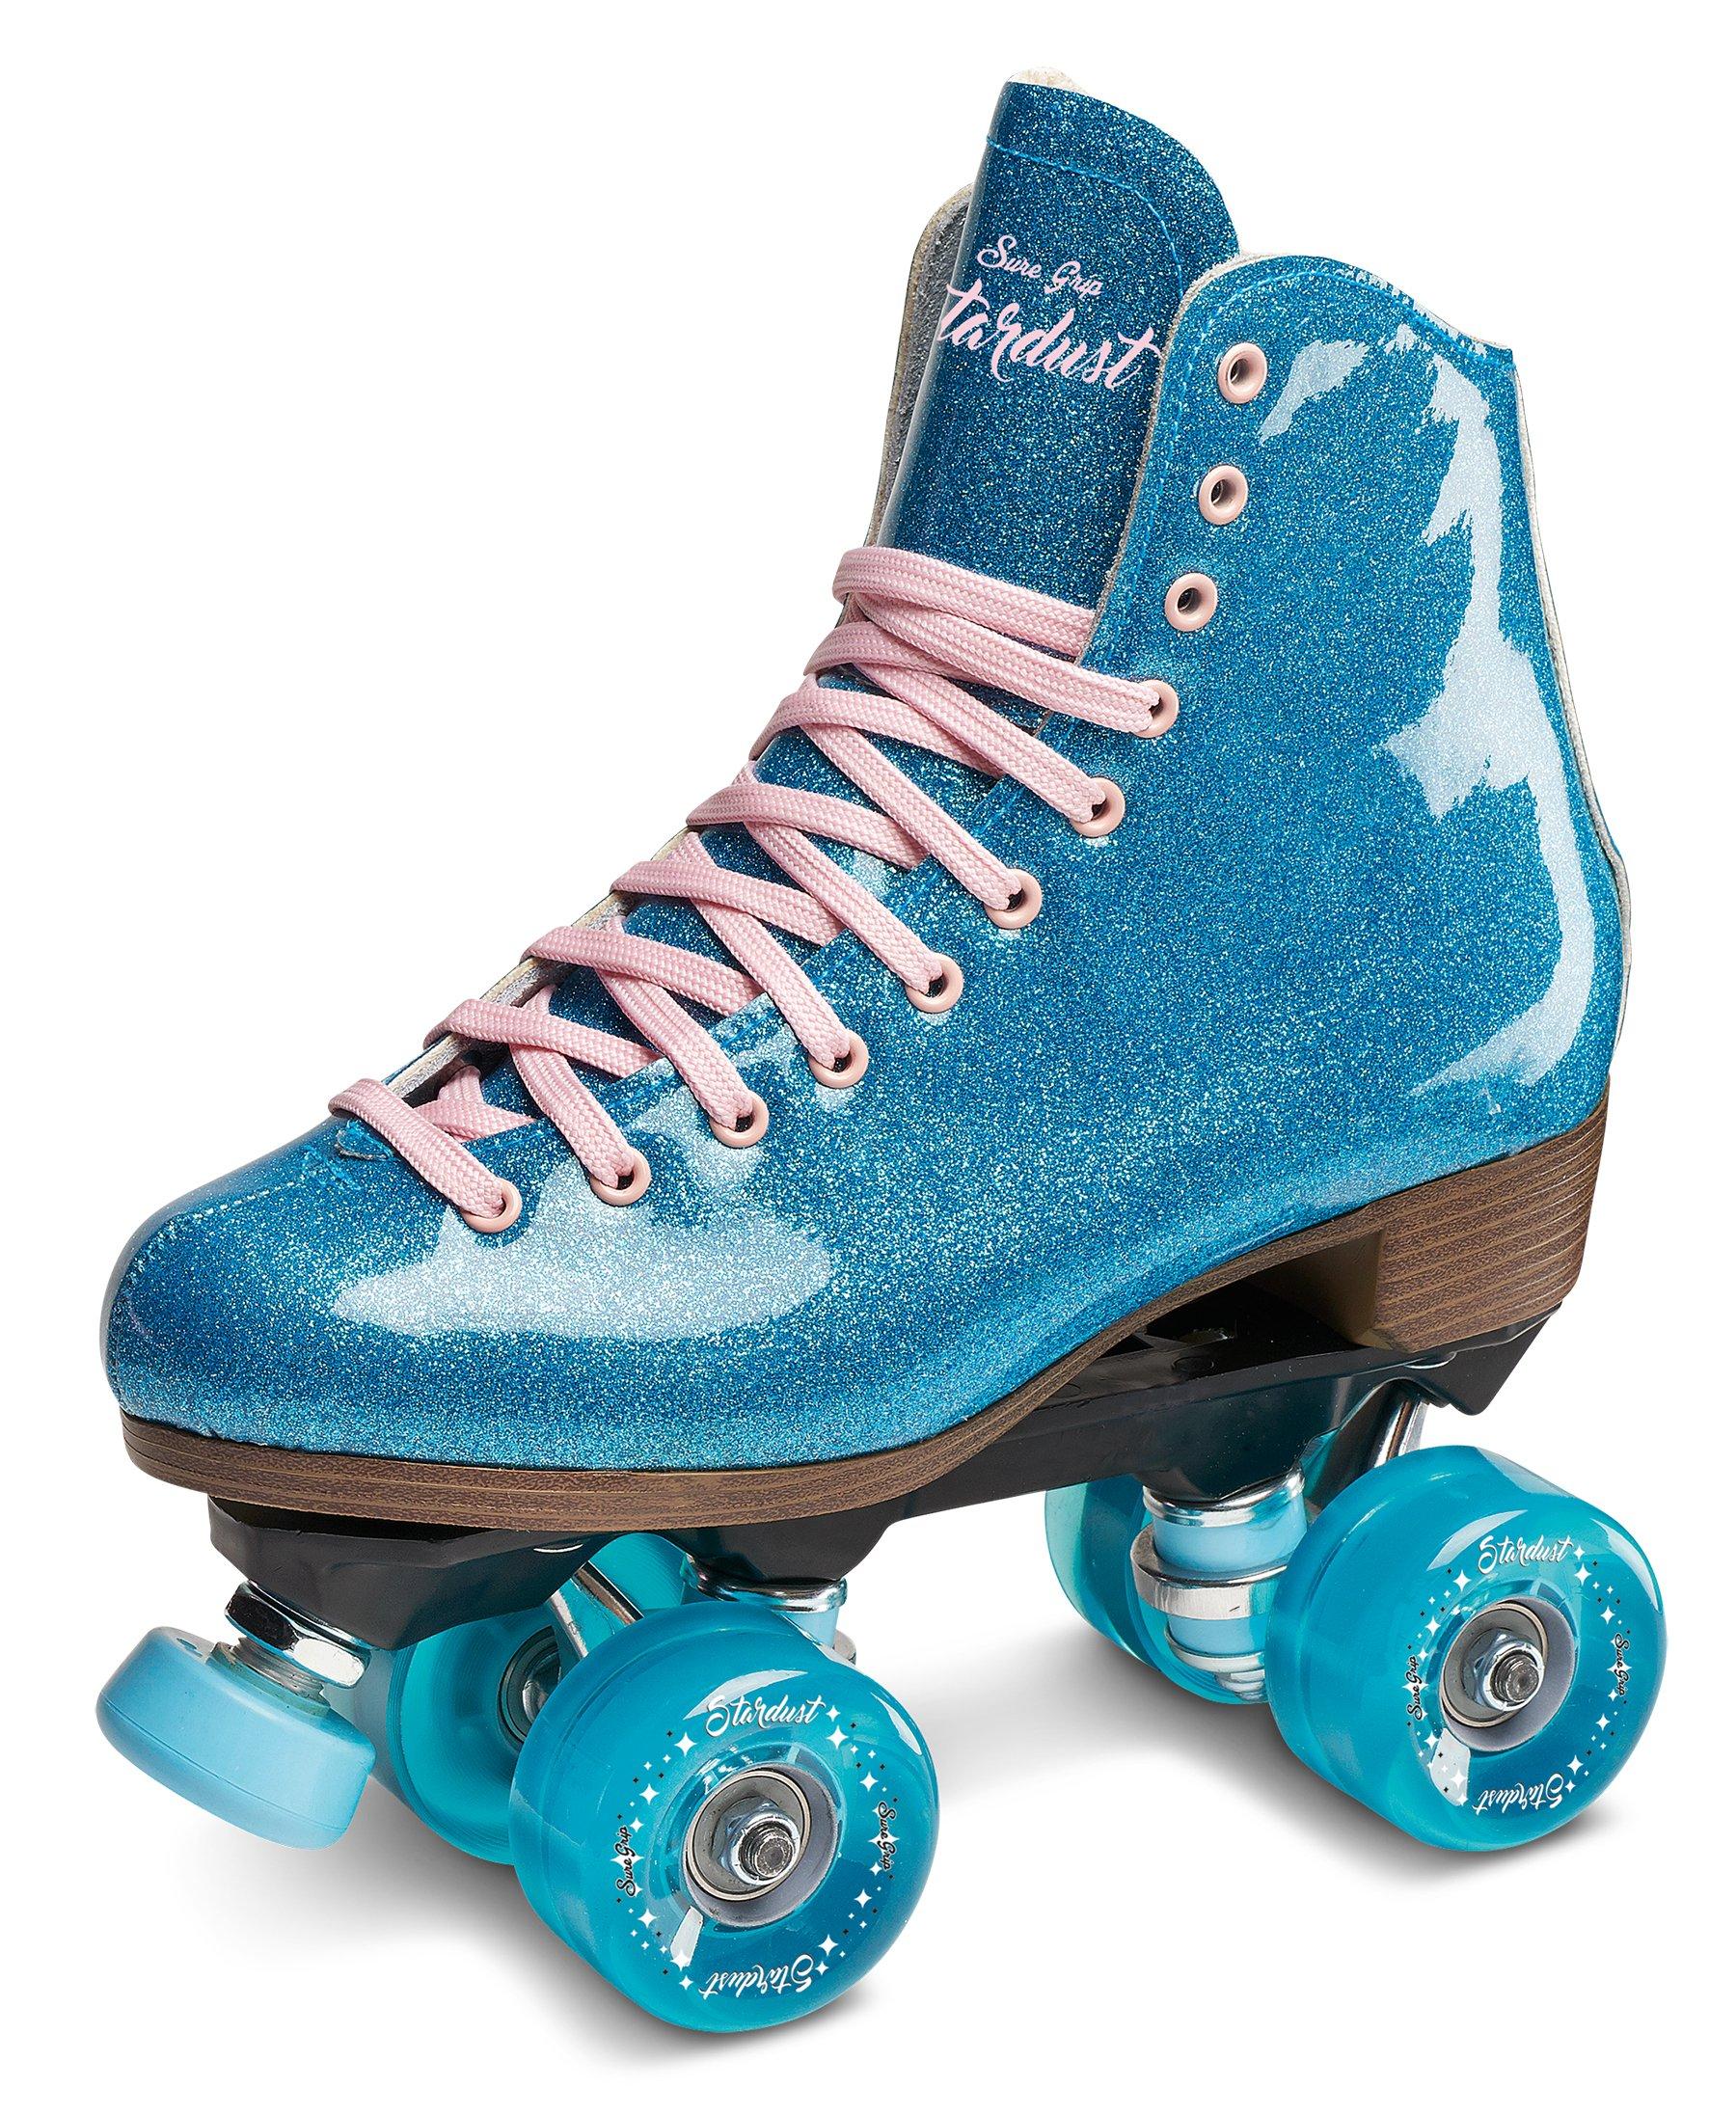 Sure-Grip Stardust Glitter Roller Skate by Sure-Grip